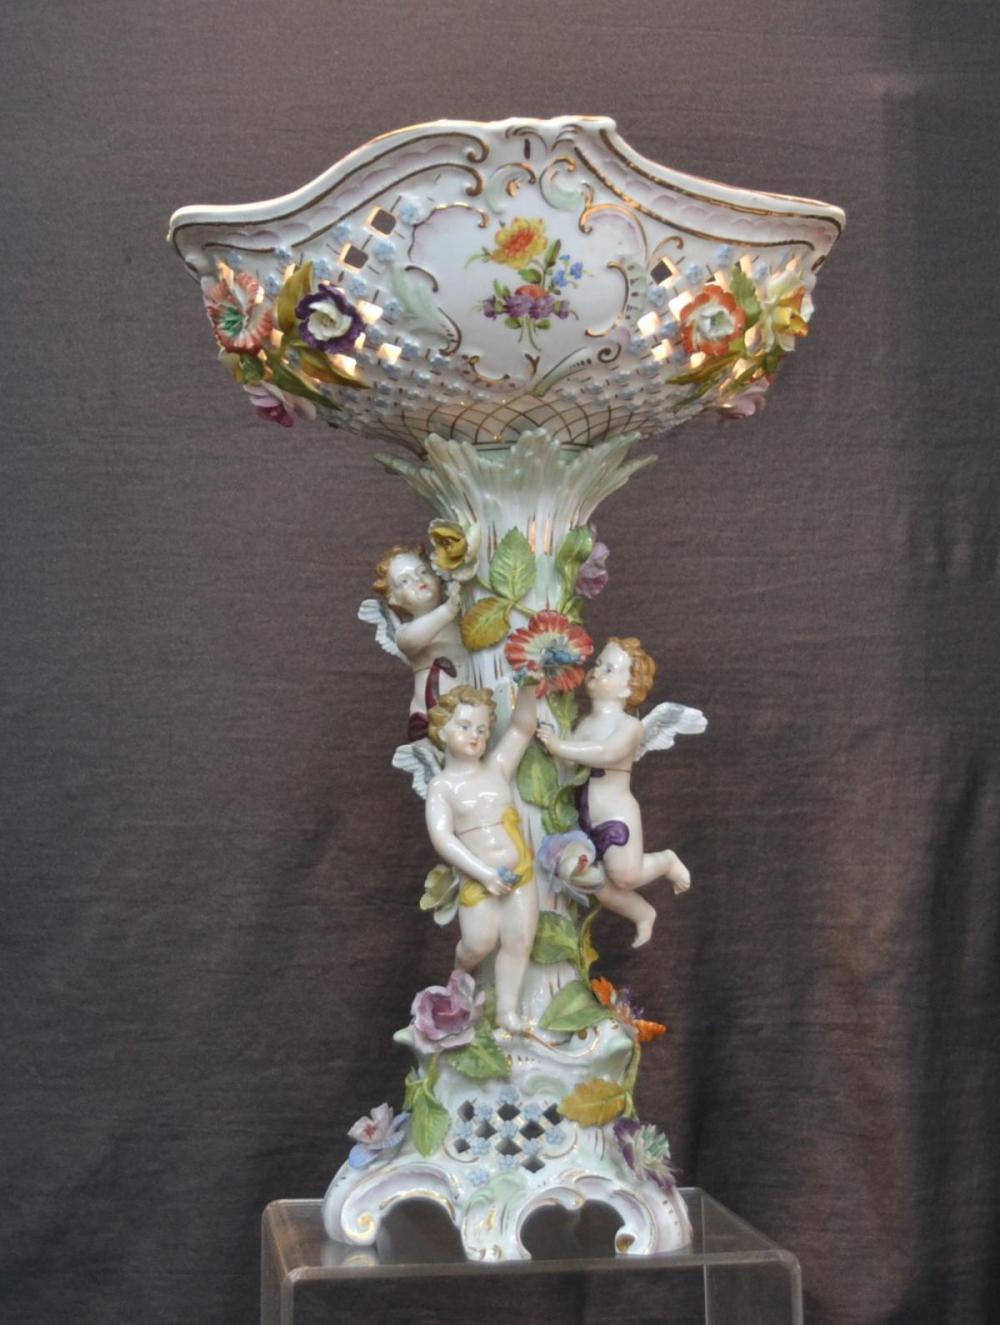 lladro bird scene vase of dresden porcelain for sale at online auction buy rare dresden with regard to large carl thieme dresden center piece